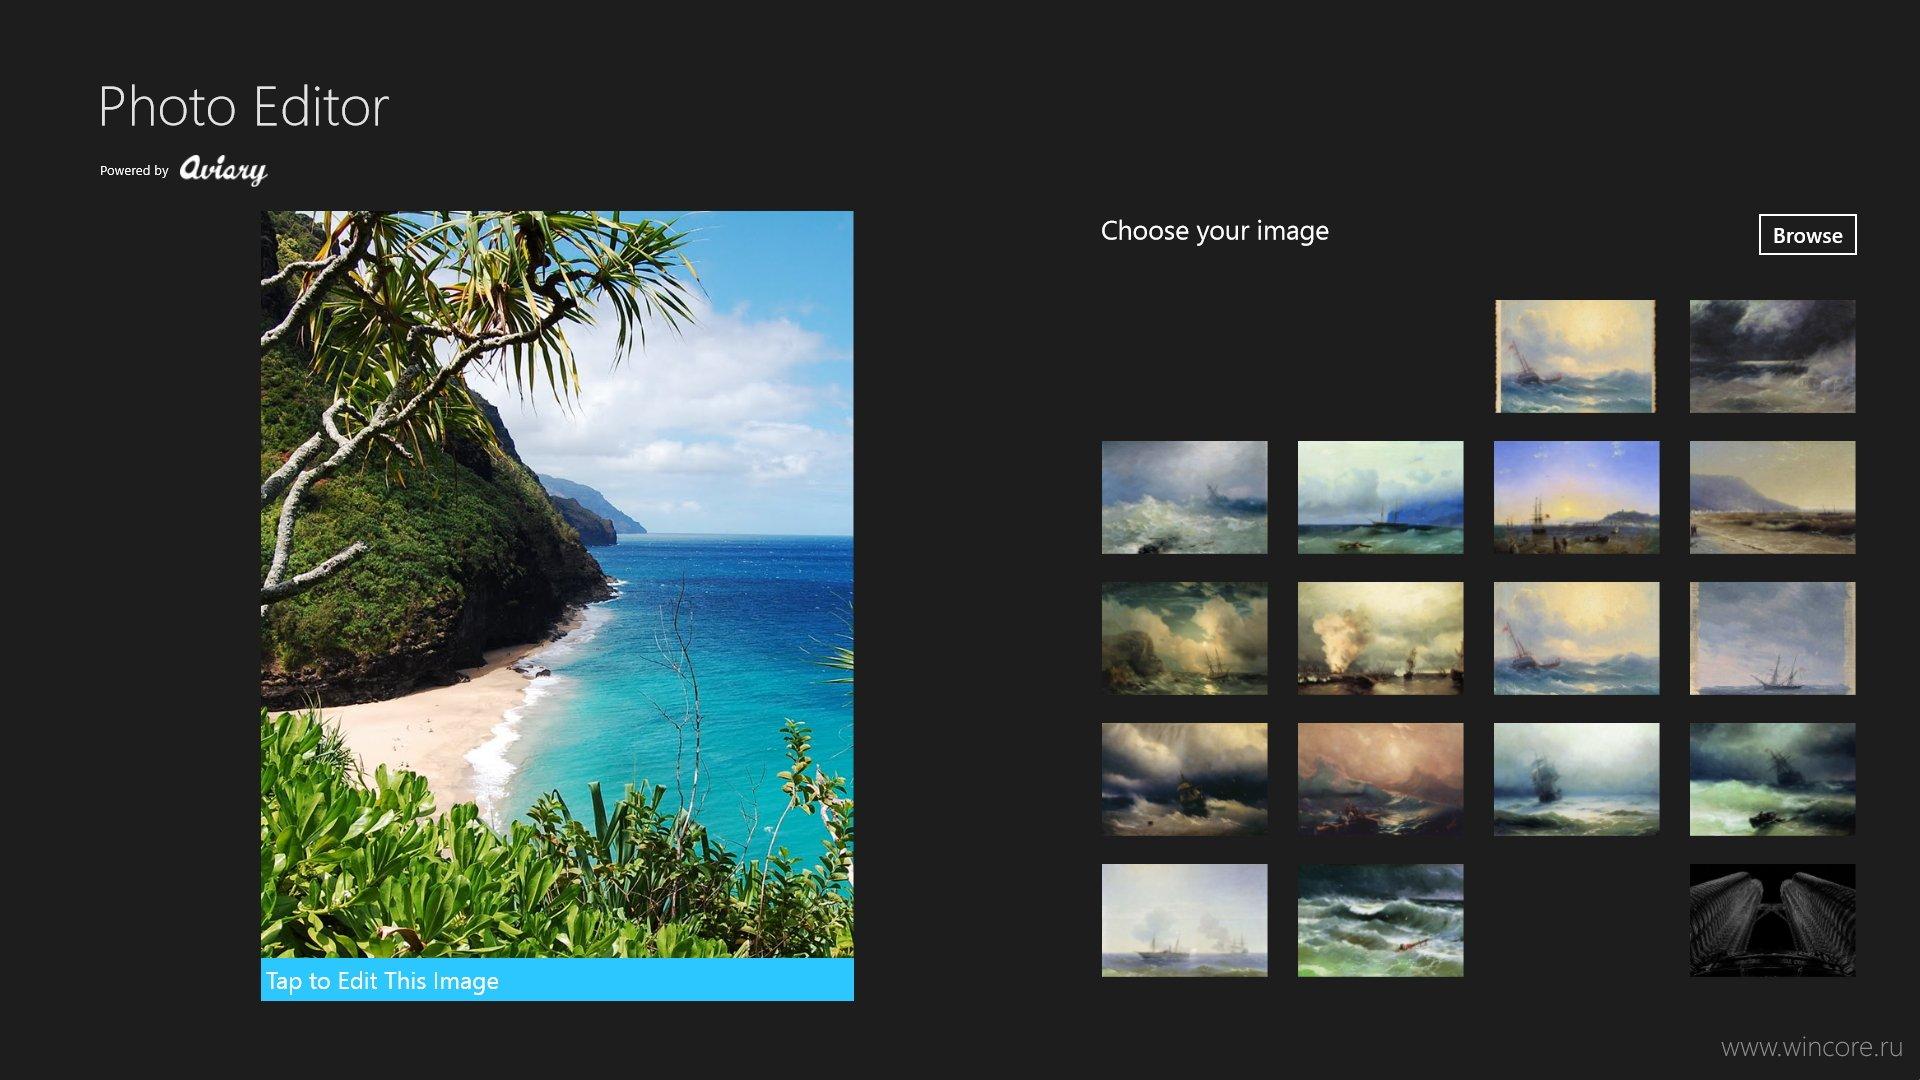 Photo Editor — приложение для базовой ...: www.wincore.ru/programs/725-photo-editor-prilozhenie-dlya-bazovoy...